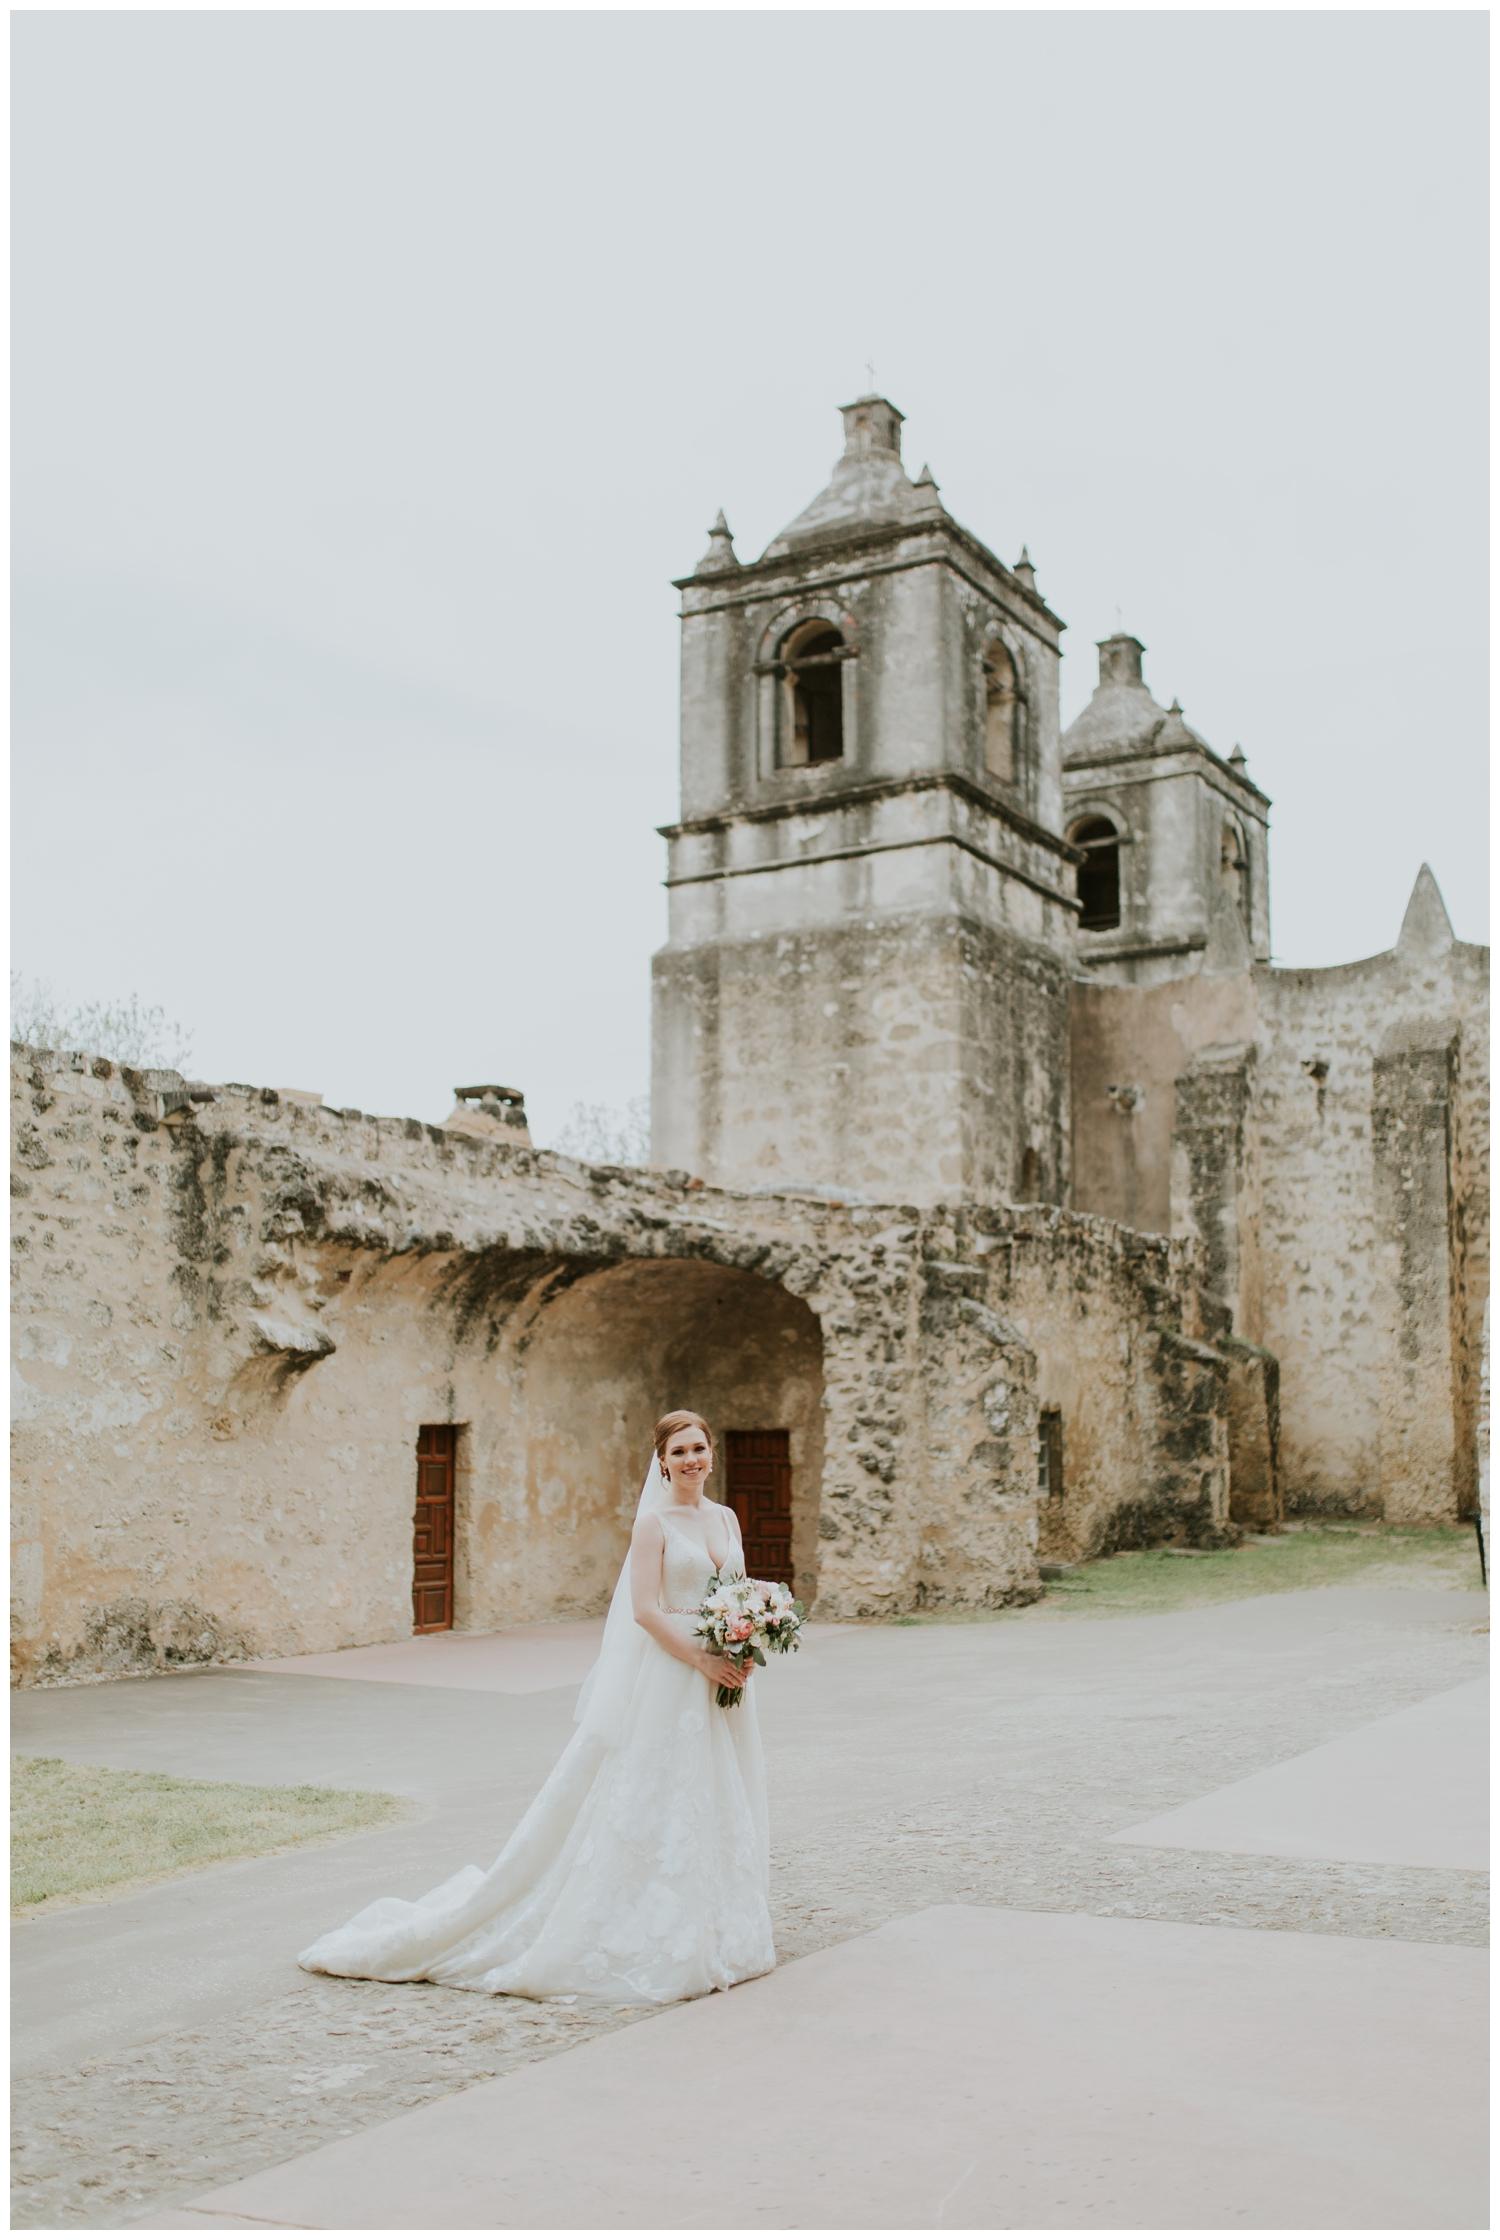 Jenna+Brandon, Mission Concepcion Wedding, San Antonio, Contista Productions Wedding Photography_0084.jpg